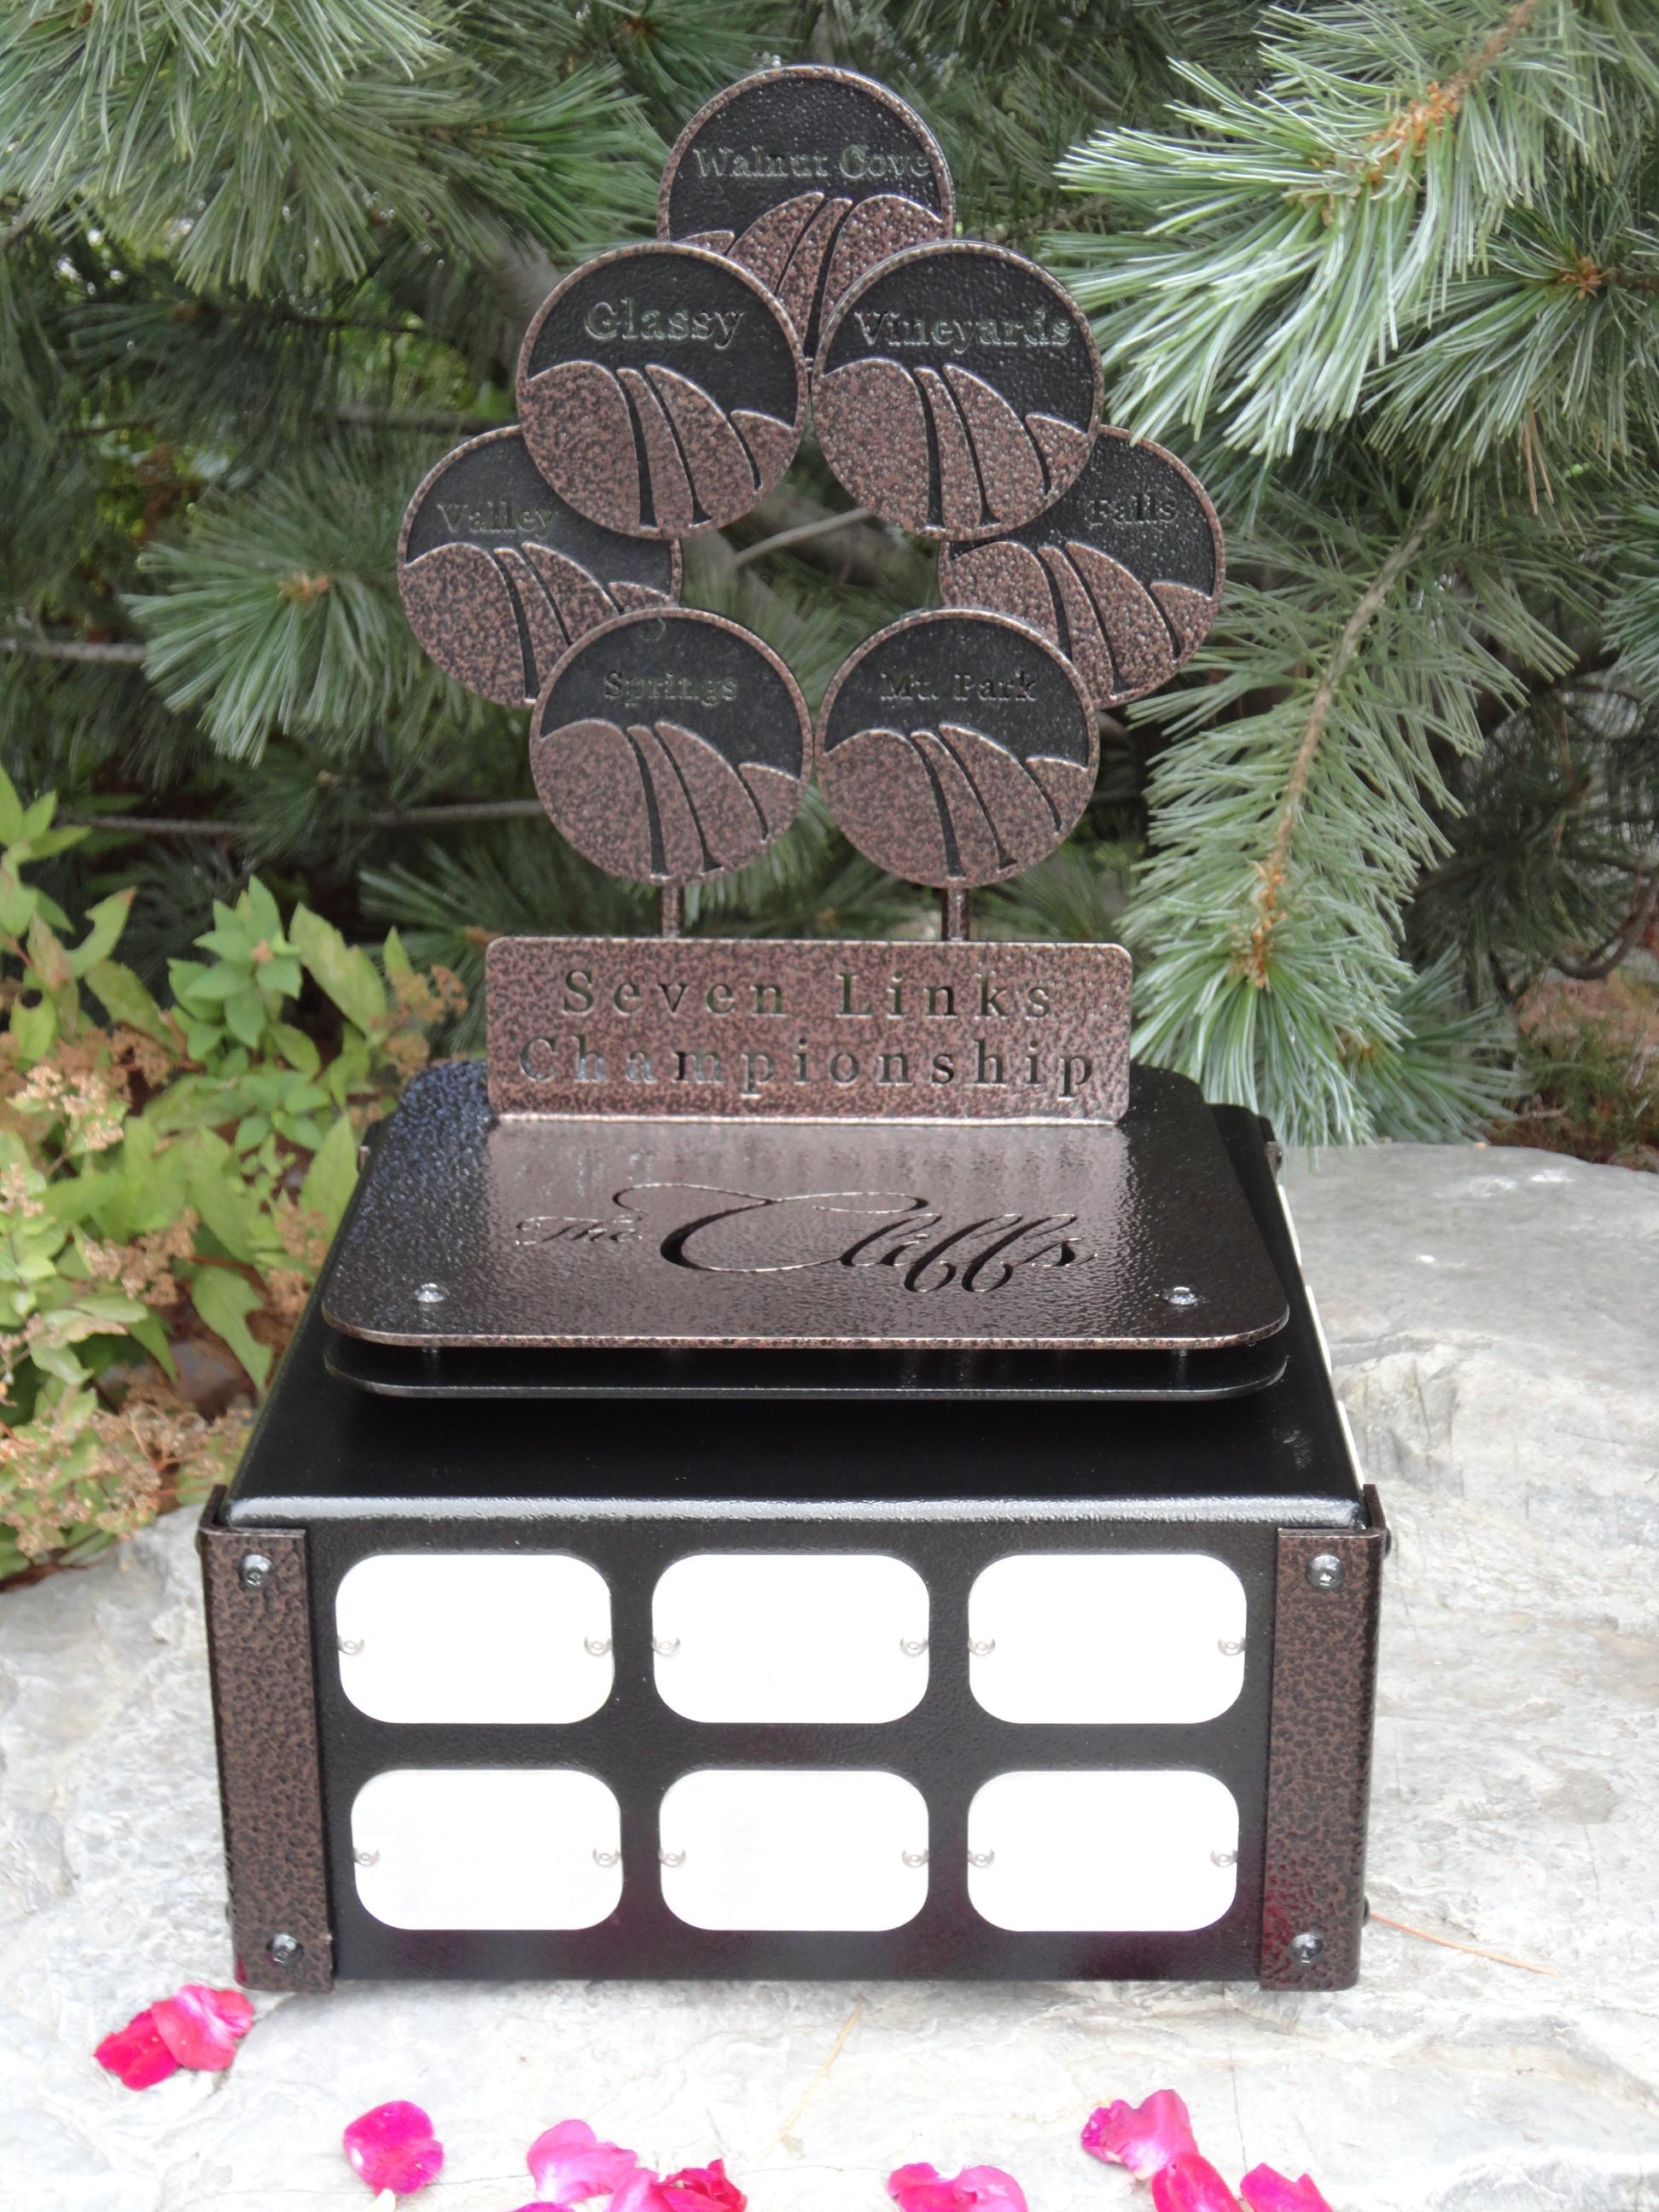 Cliffs -Club Championship Trophy